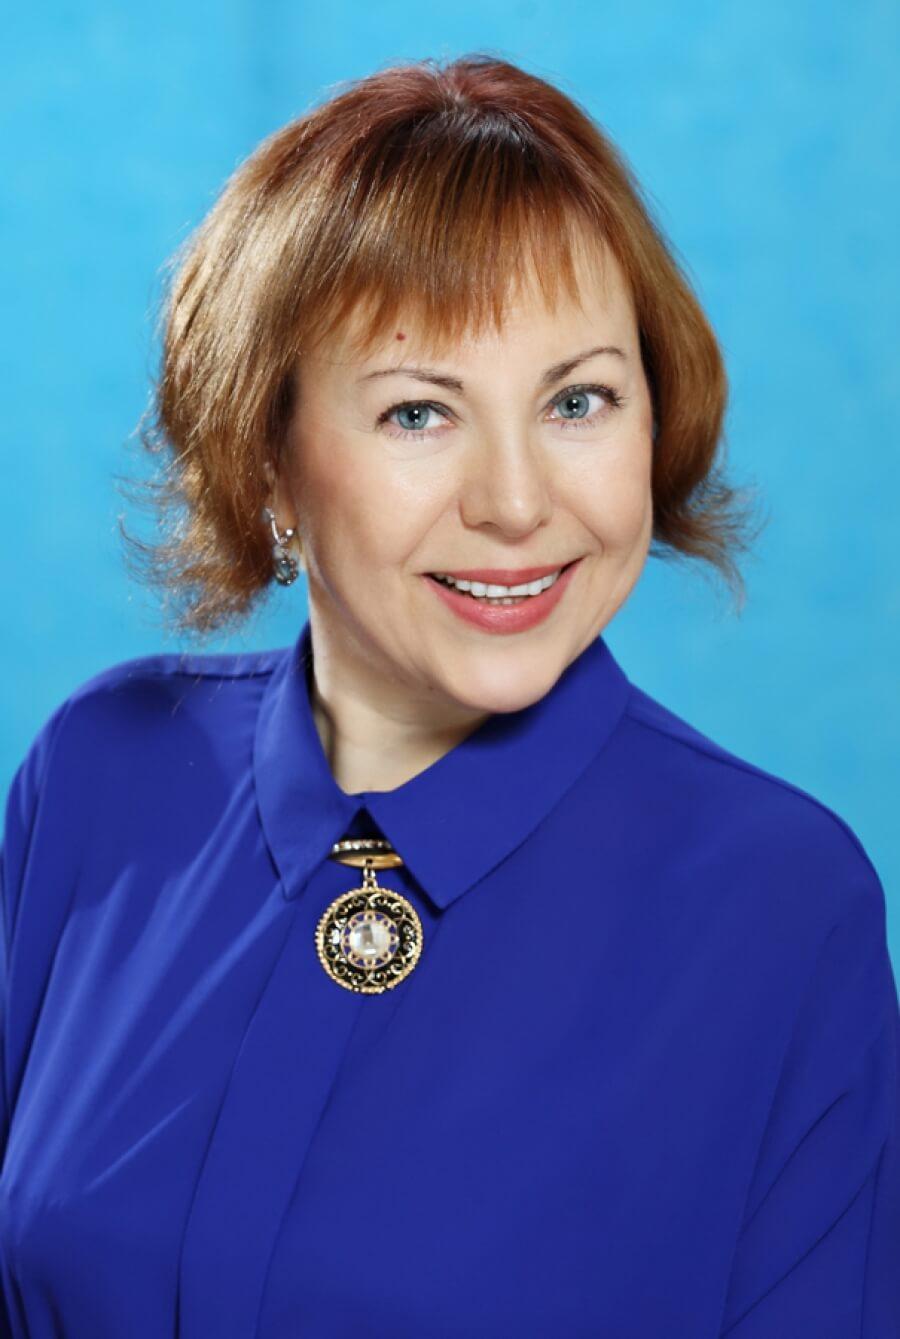 Гарбузова Ольга Николаевна